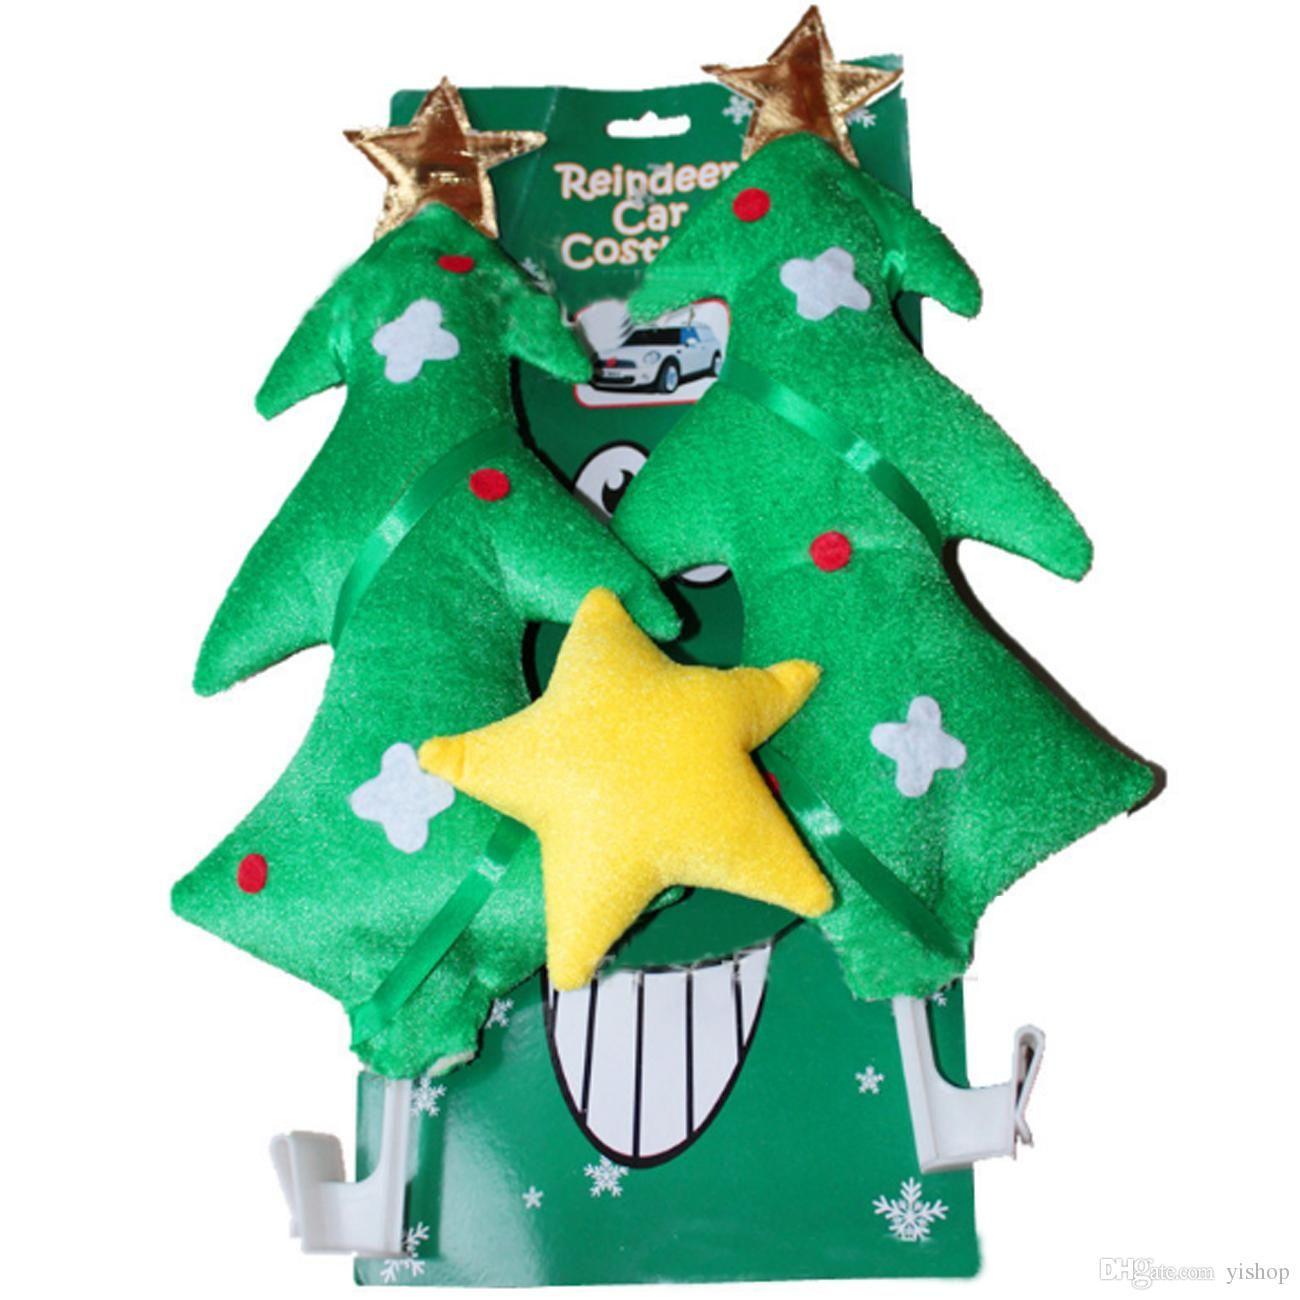 New Green Christmas Tree Car Costume Tree & Star Christmas Fun Rudolph Reindeer Ears For All Vehicls Car Decoration Xmas Gift Cheap Christmas